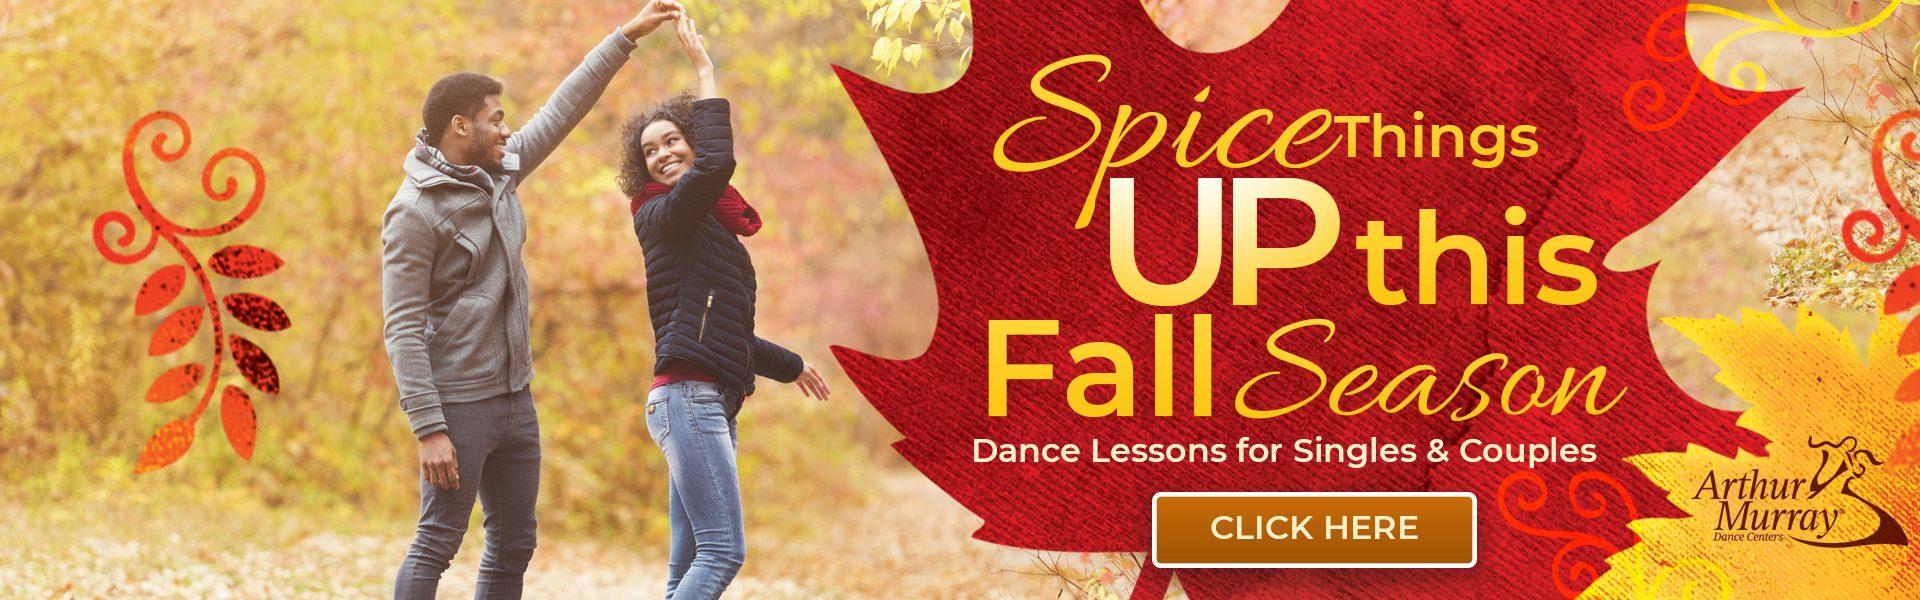 Dance lessons plano